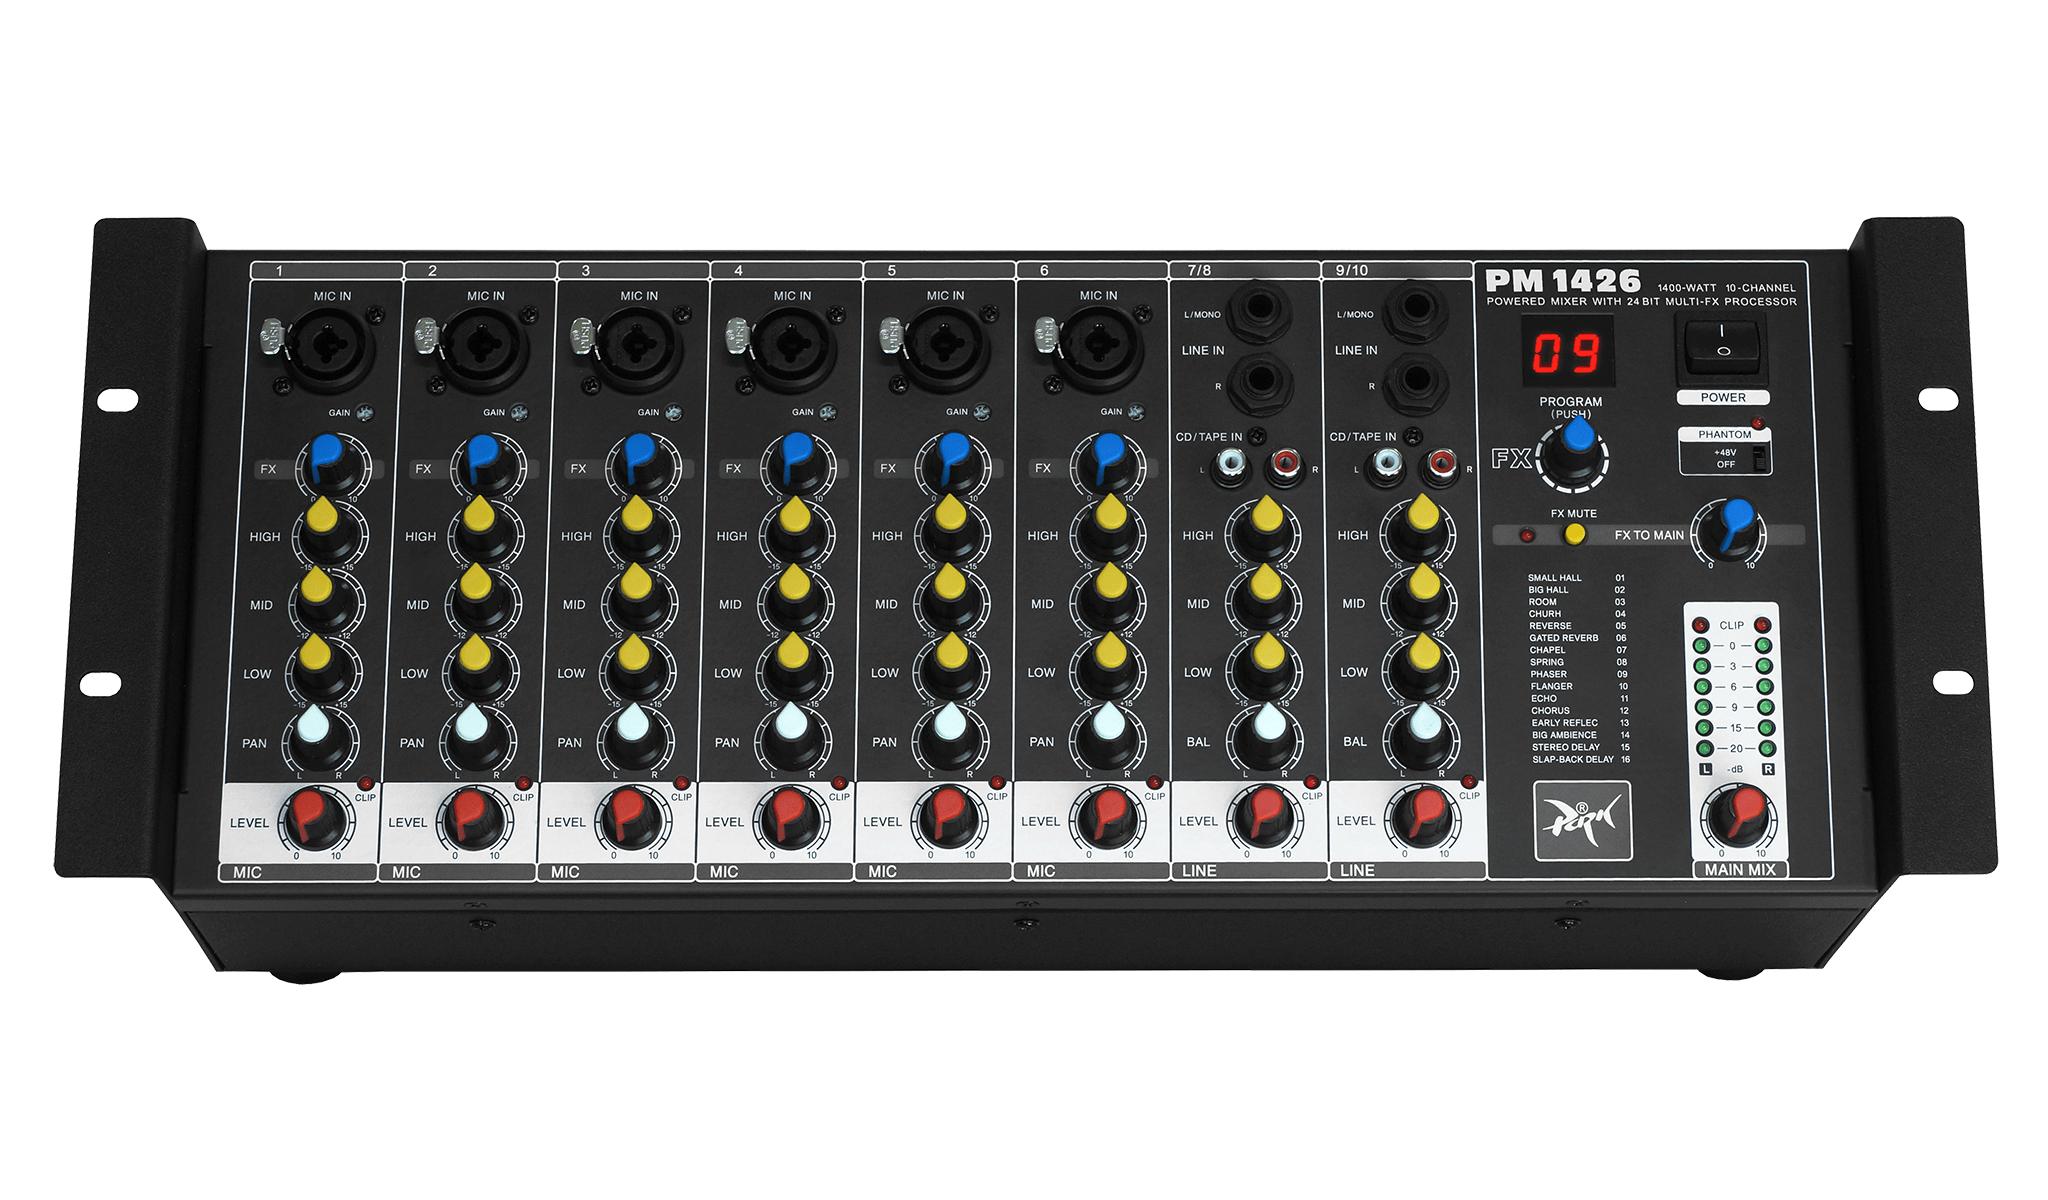 PM1426